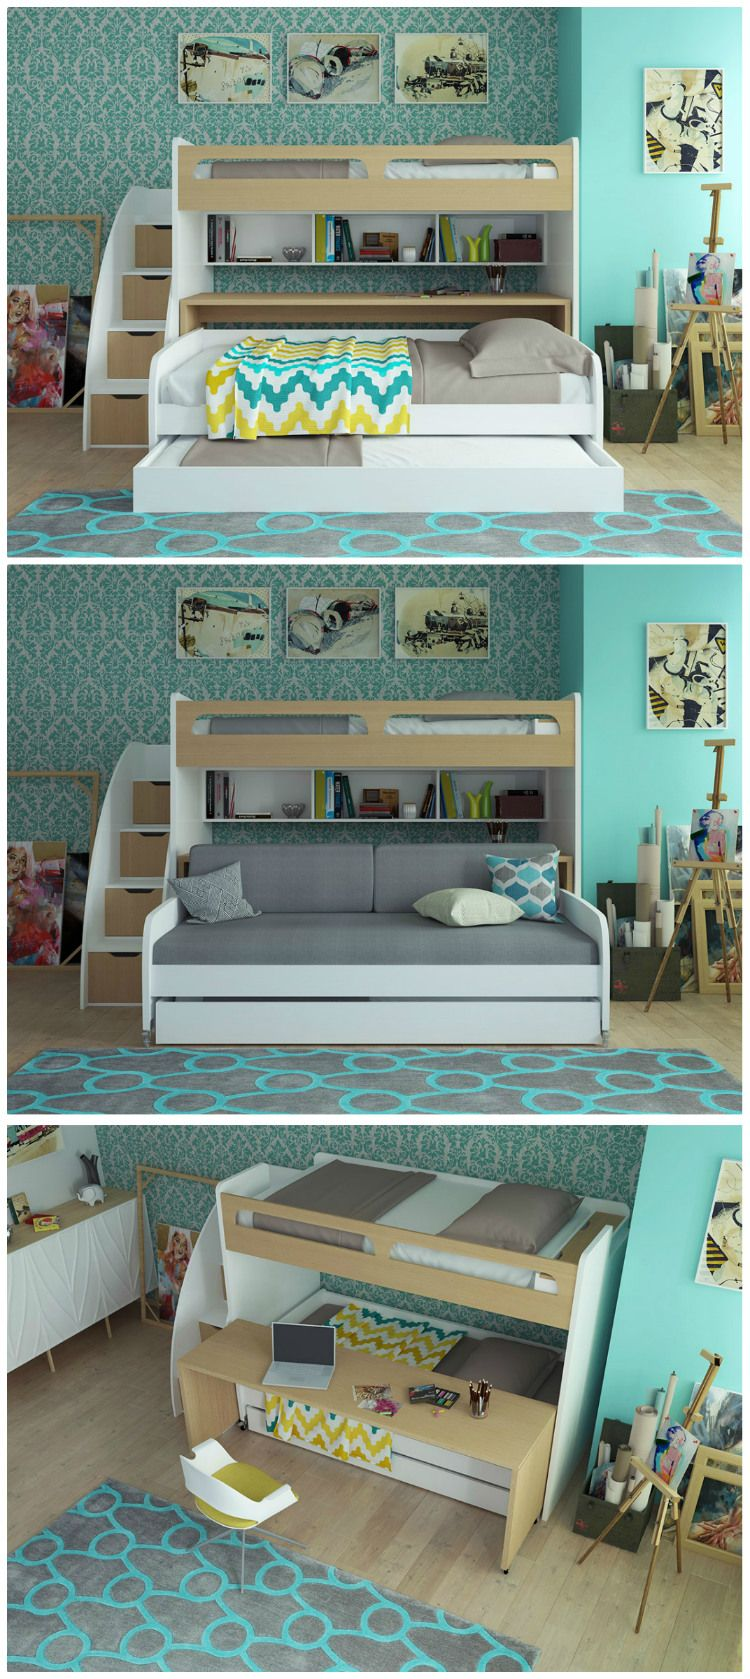 Best Ten Great Bunk And Loft Beds For Kids Kids Bunk Beds 400 x 300